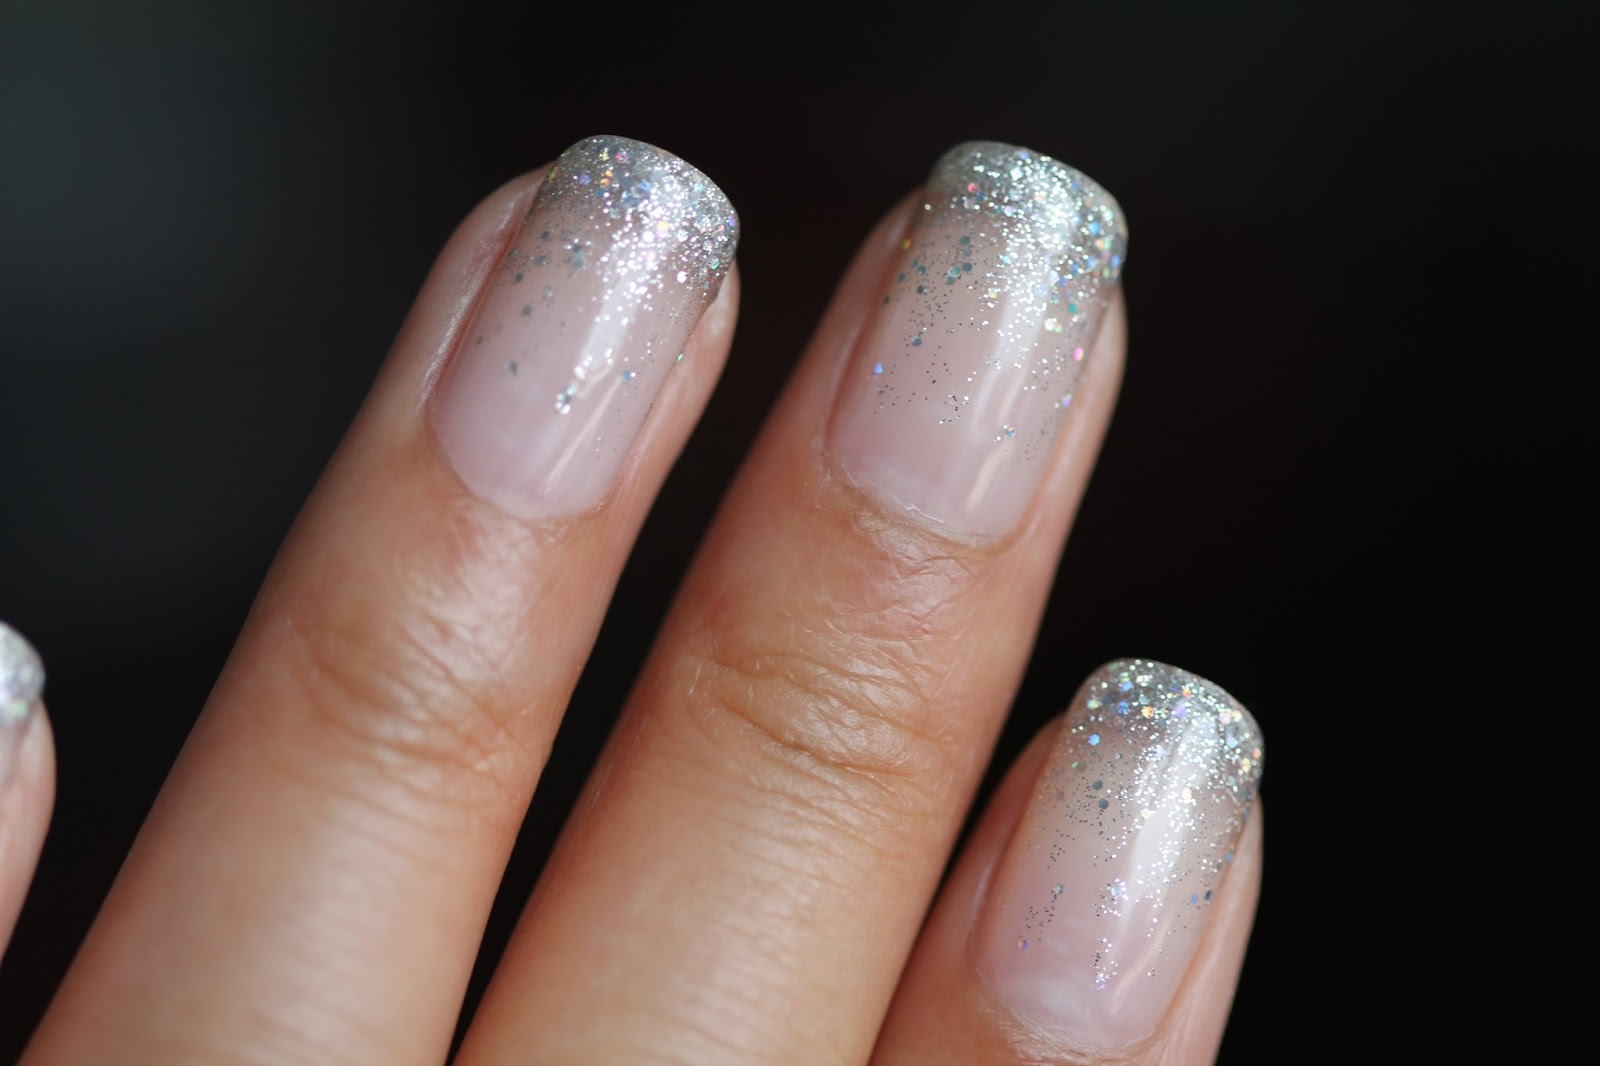 Dsk Steph Cindys Nails Glitter Waterfall Shellac Nails